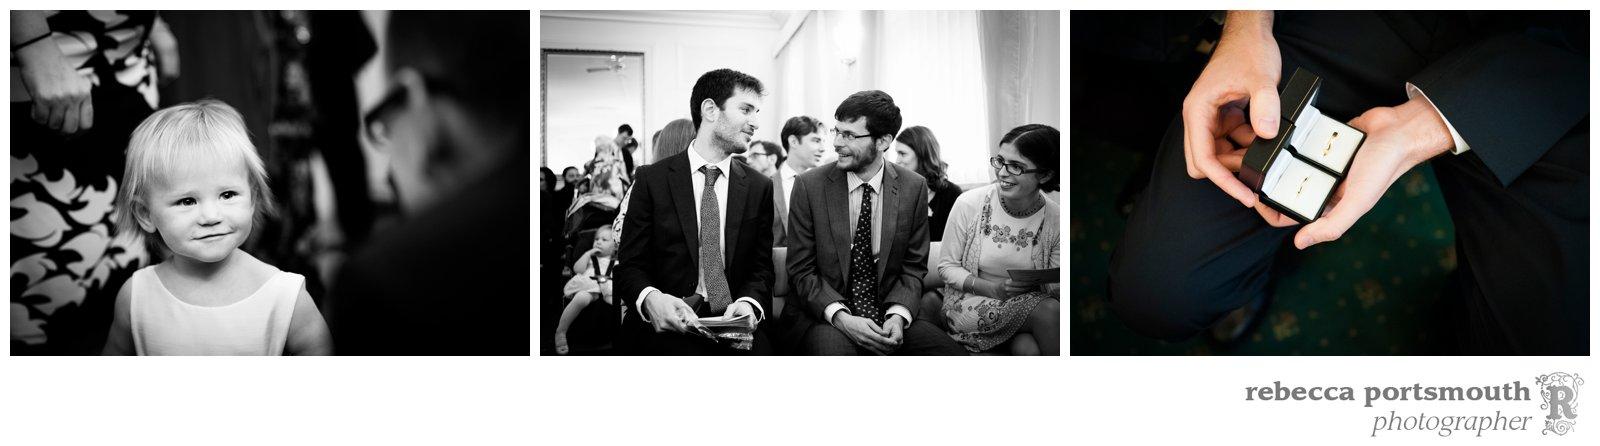 cambridge-register-office-wedding-04